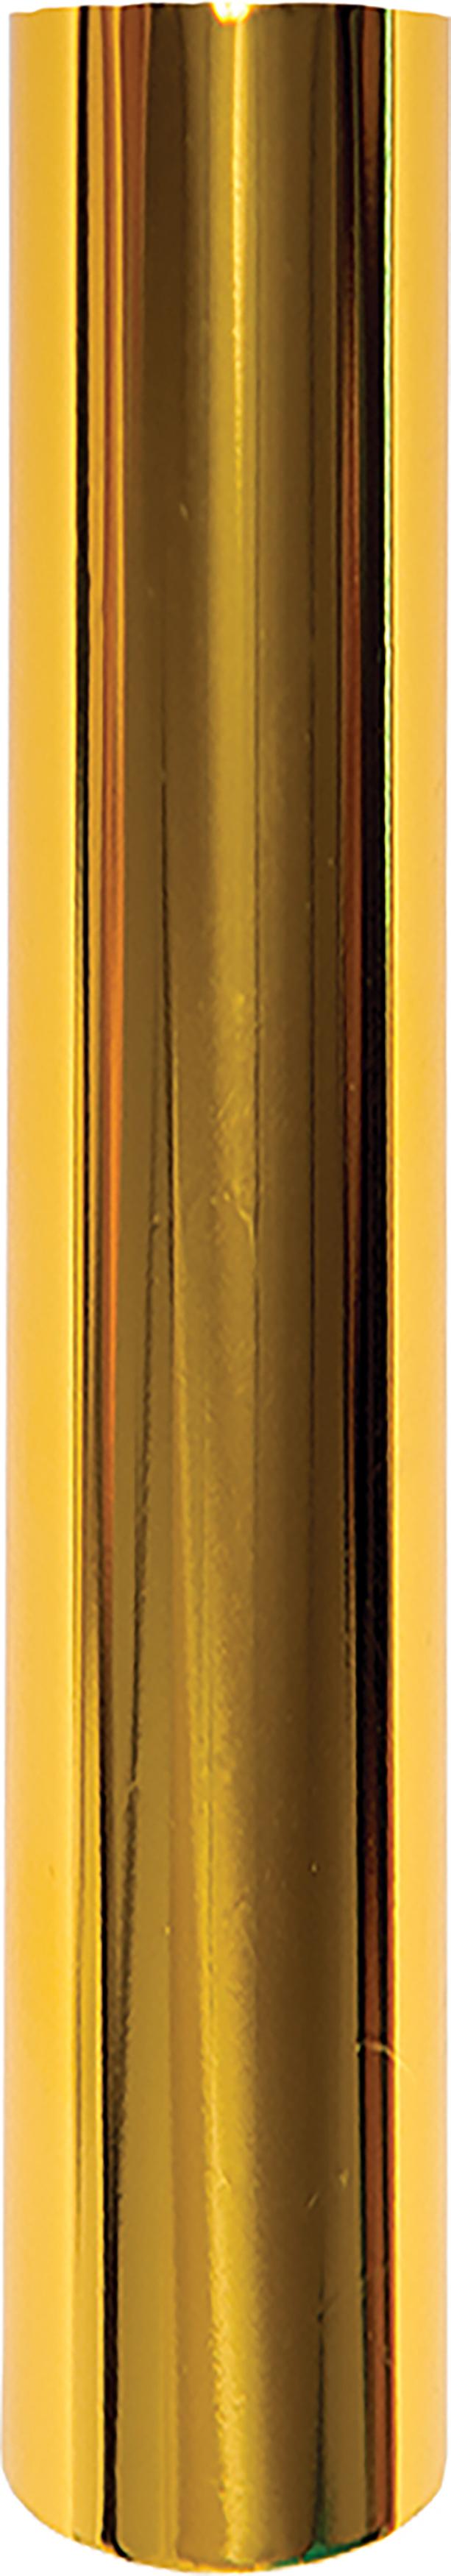 Glimmer Gold Folil